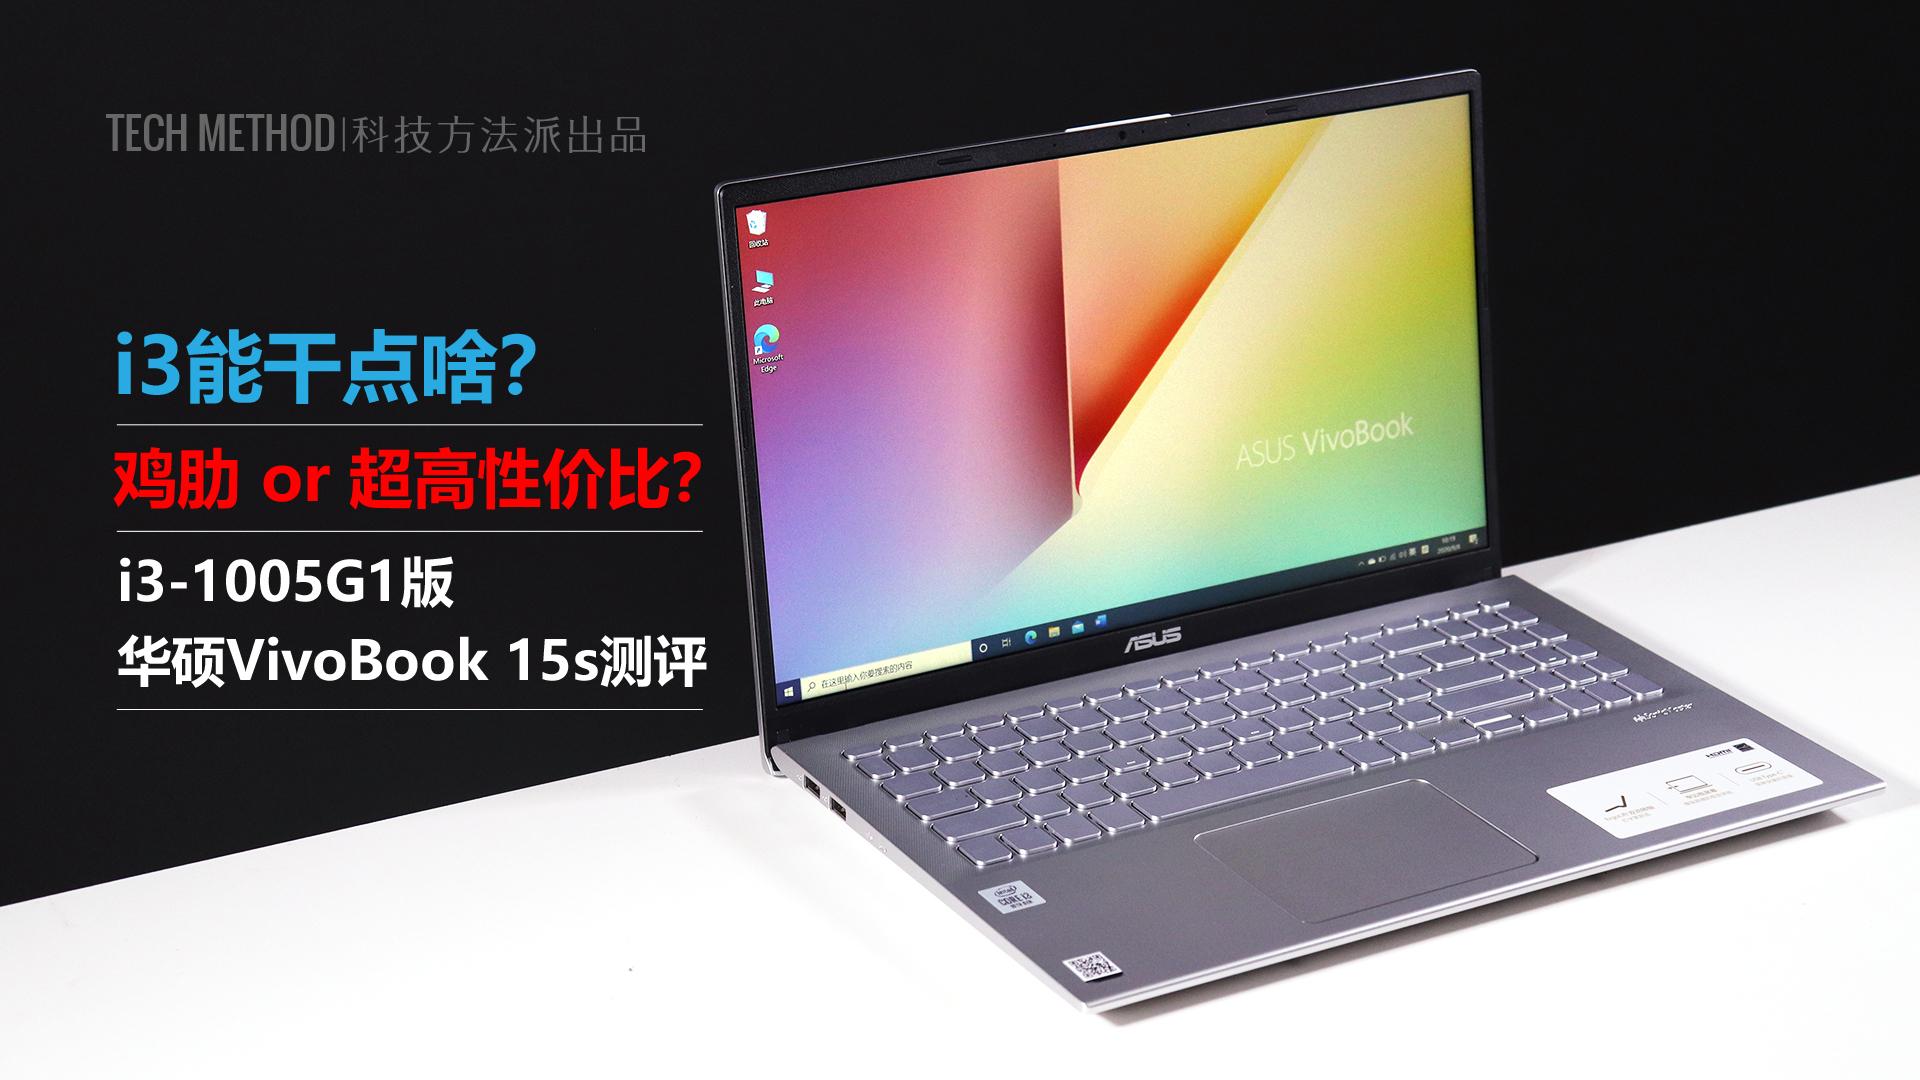 i3能干点啥?是鸡肋还是超高性价比?i3-1005G1版华硕VivoBook 15s测评